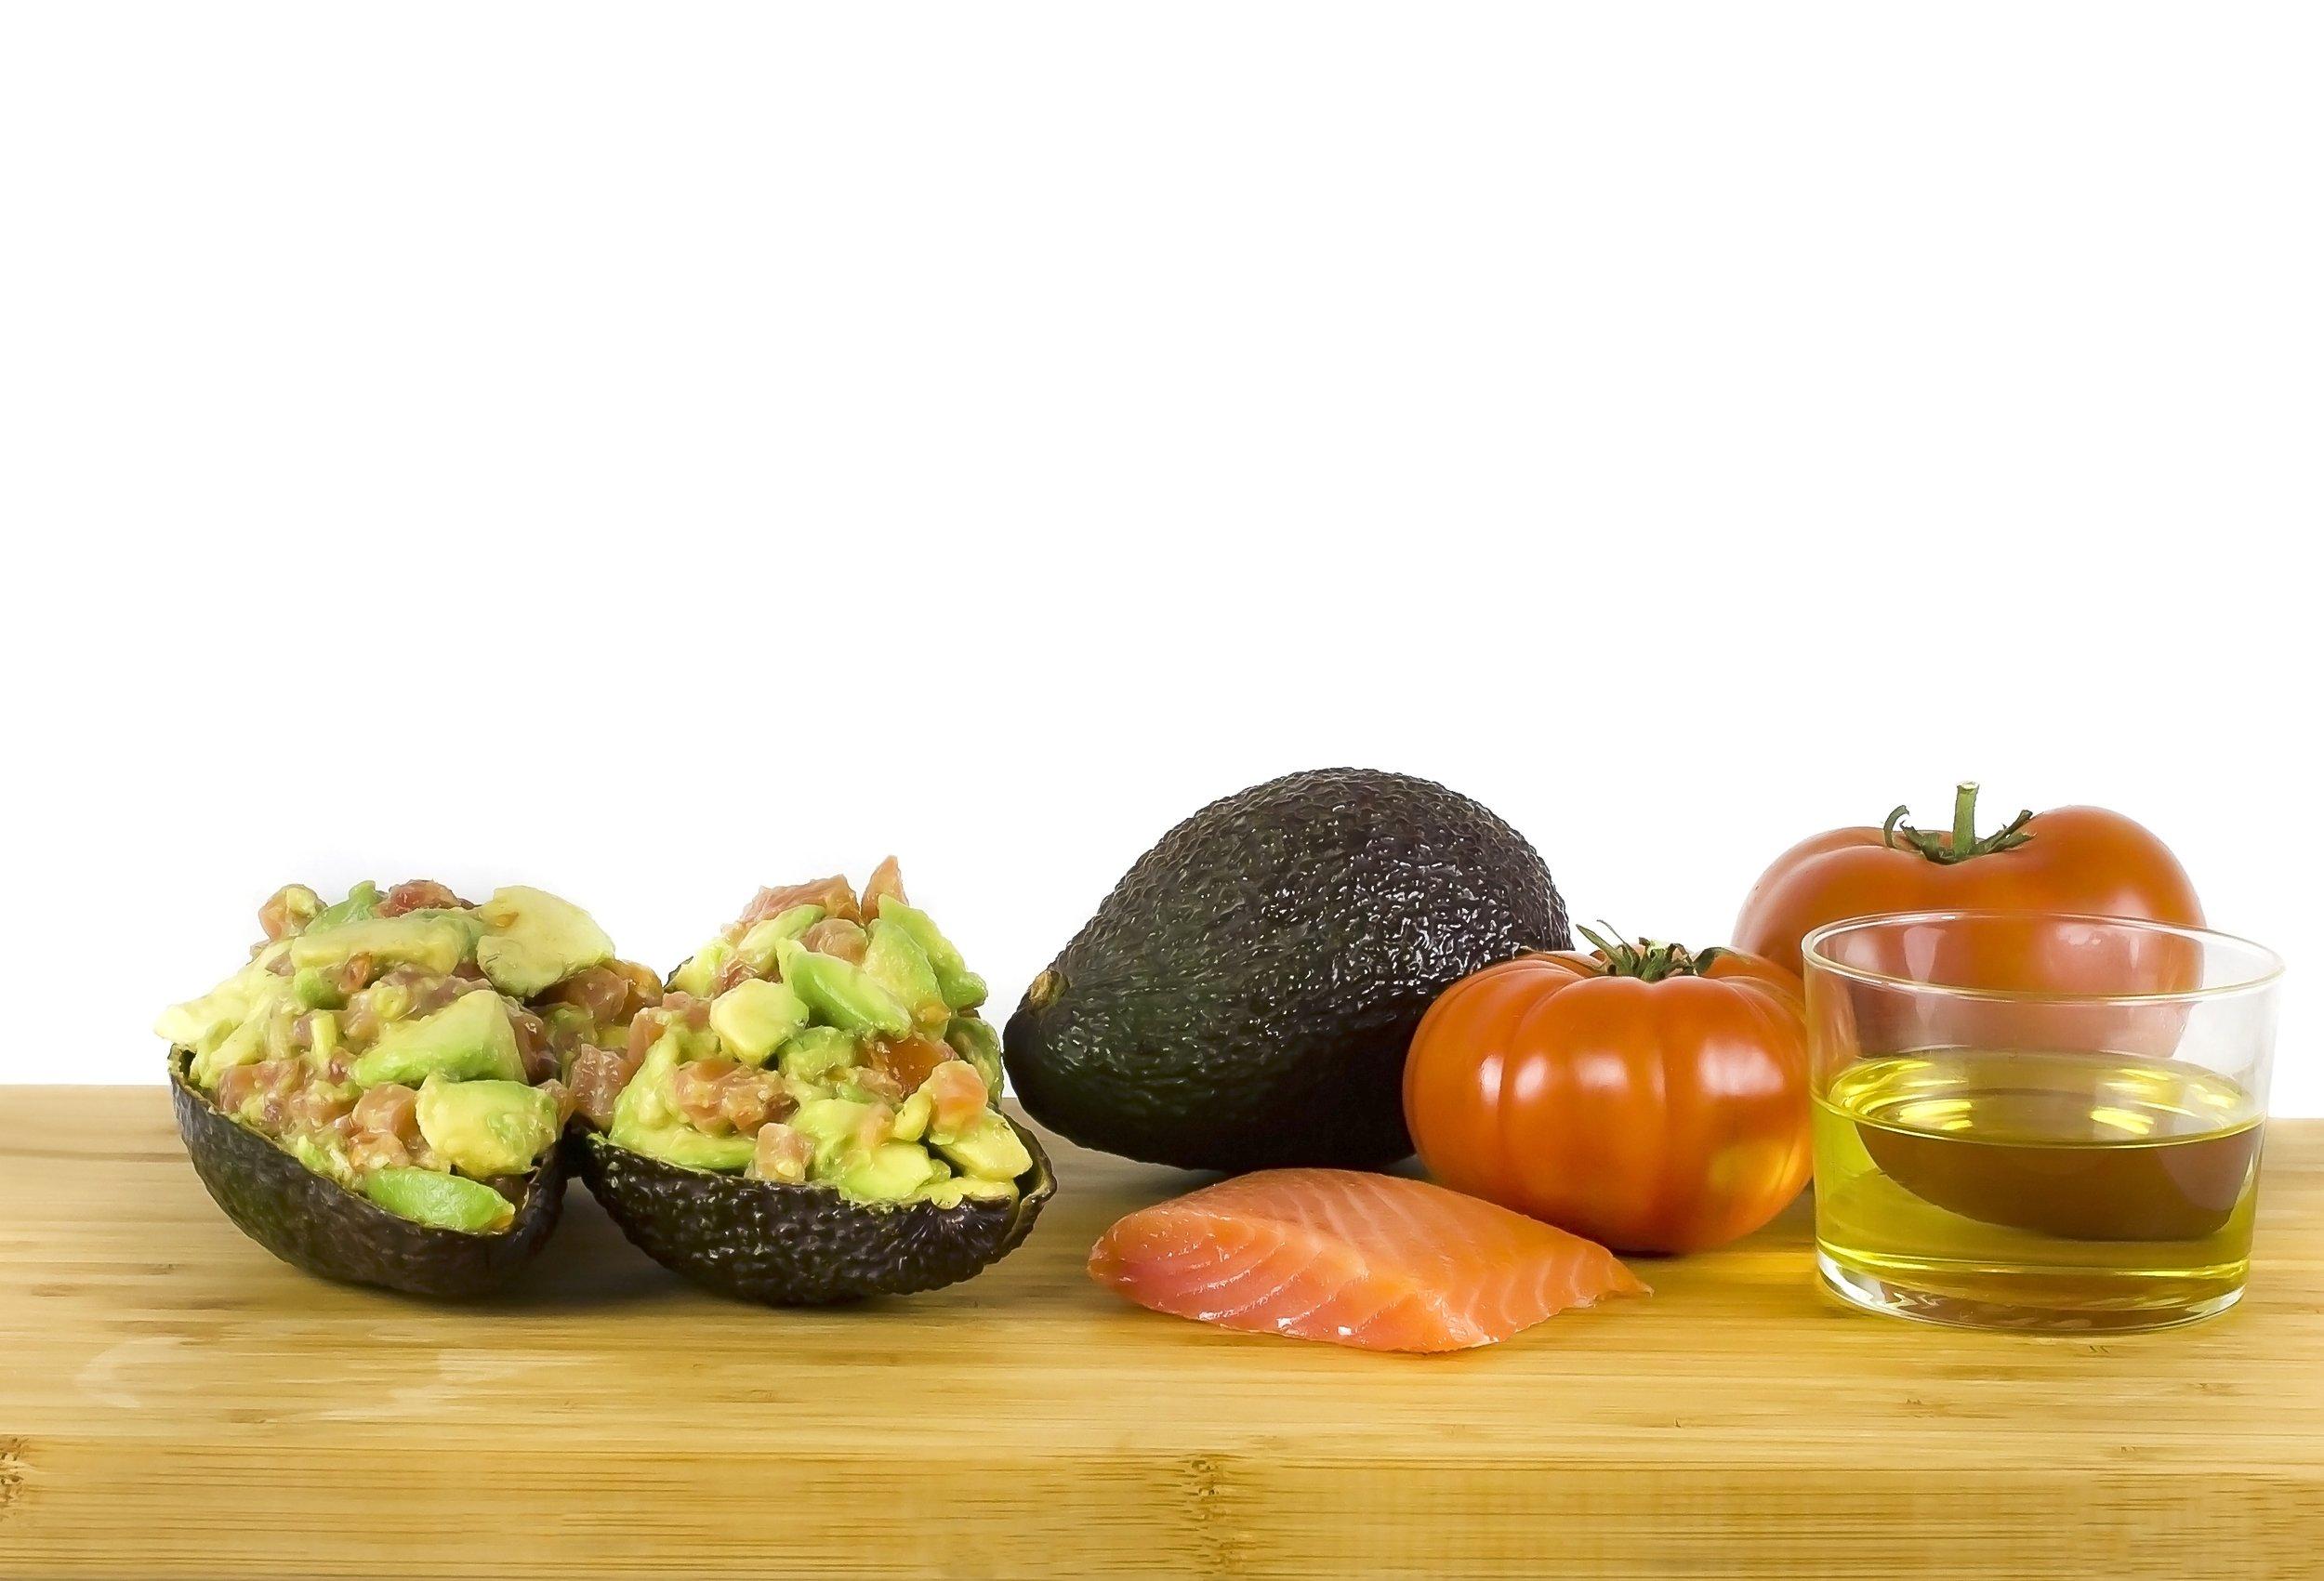 Online Personal Trainer Breakfast Recipes - Avocado & Salmon.jpg